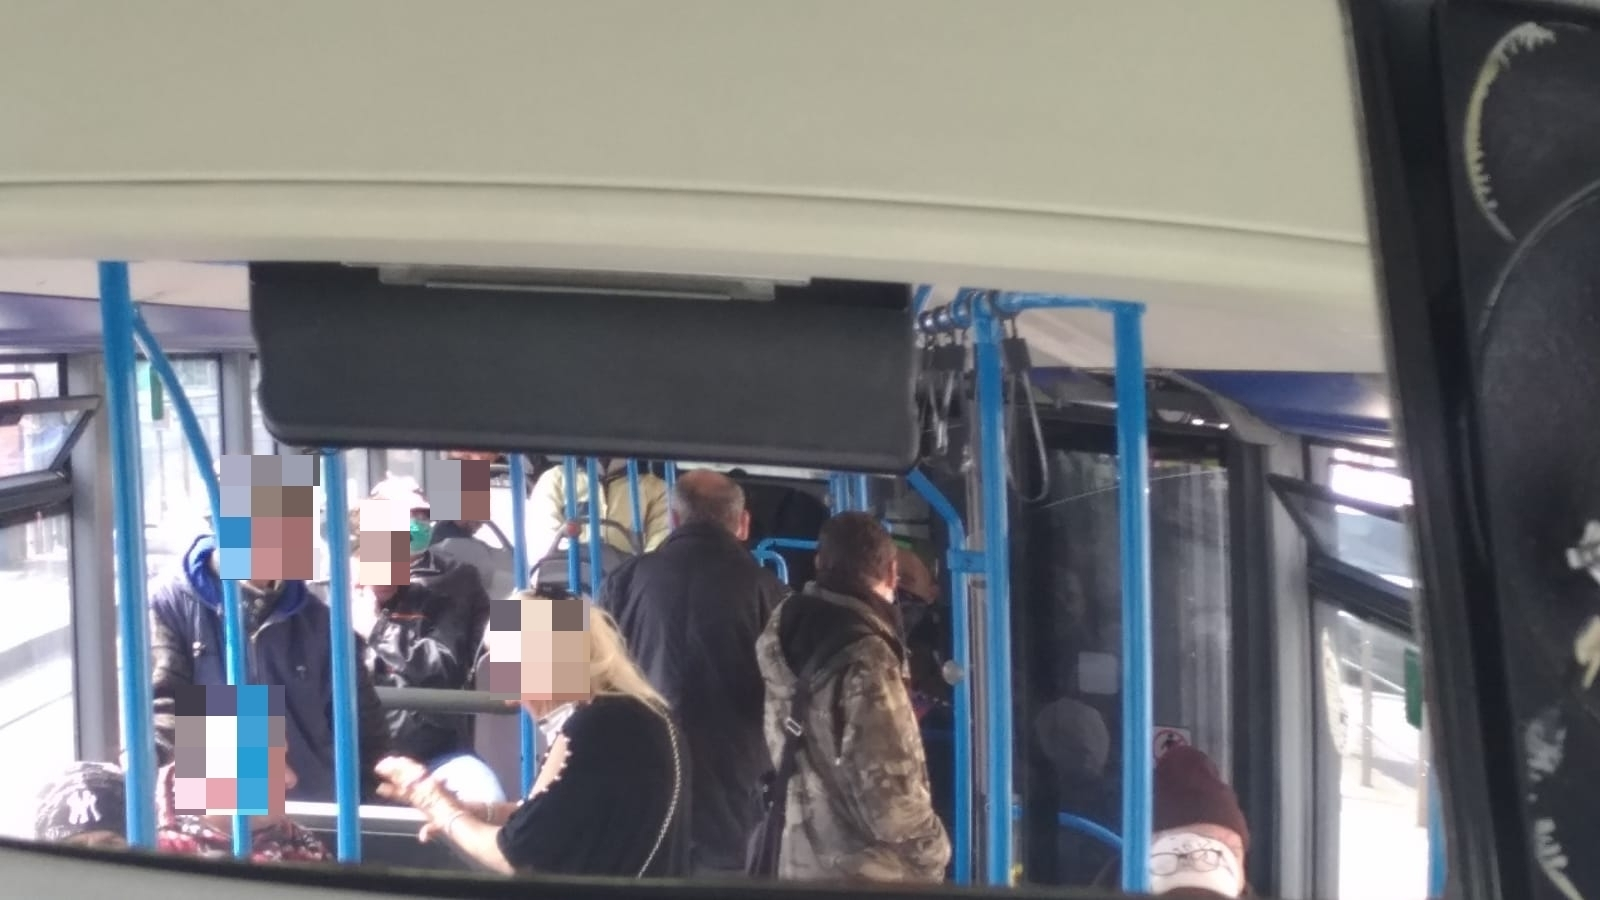 Coronavirus, a Napoli in 40 sull'autobus: sos sindacato